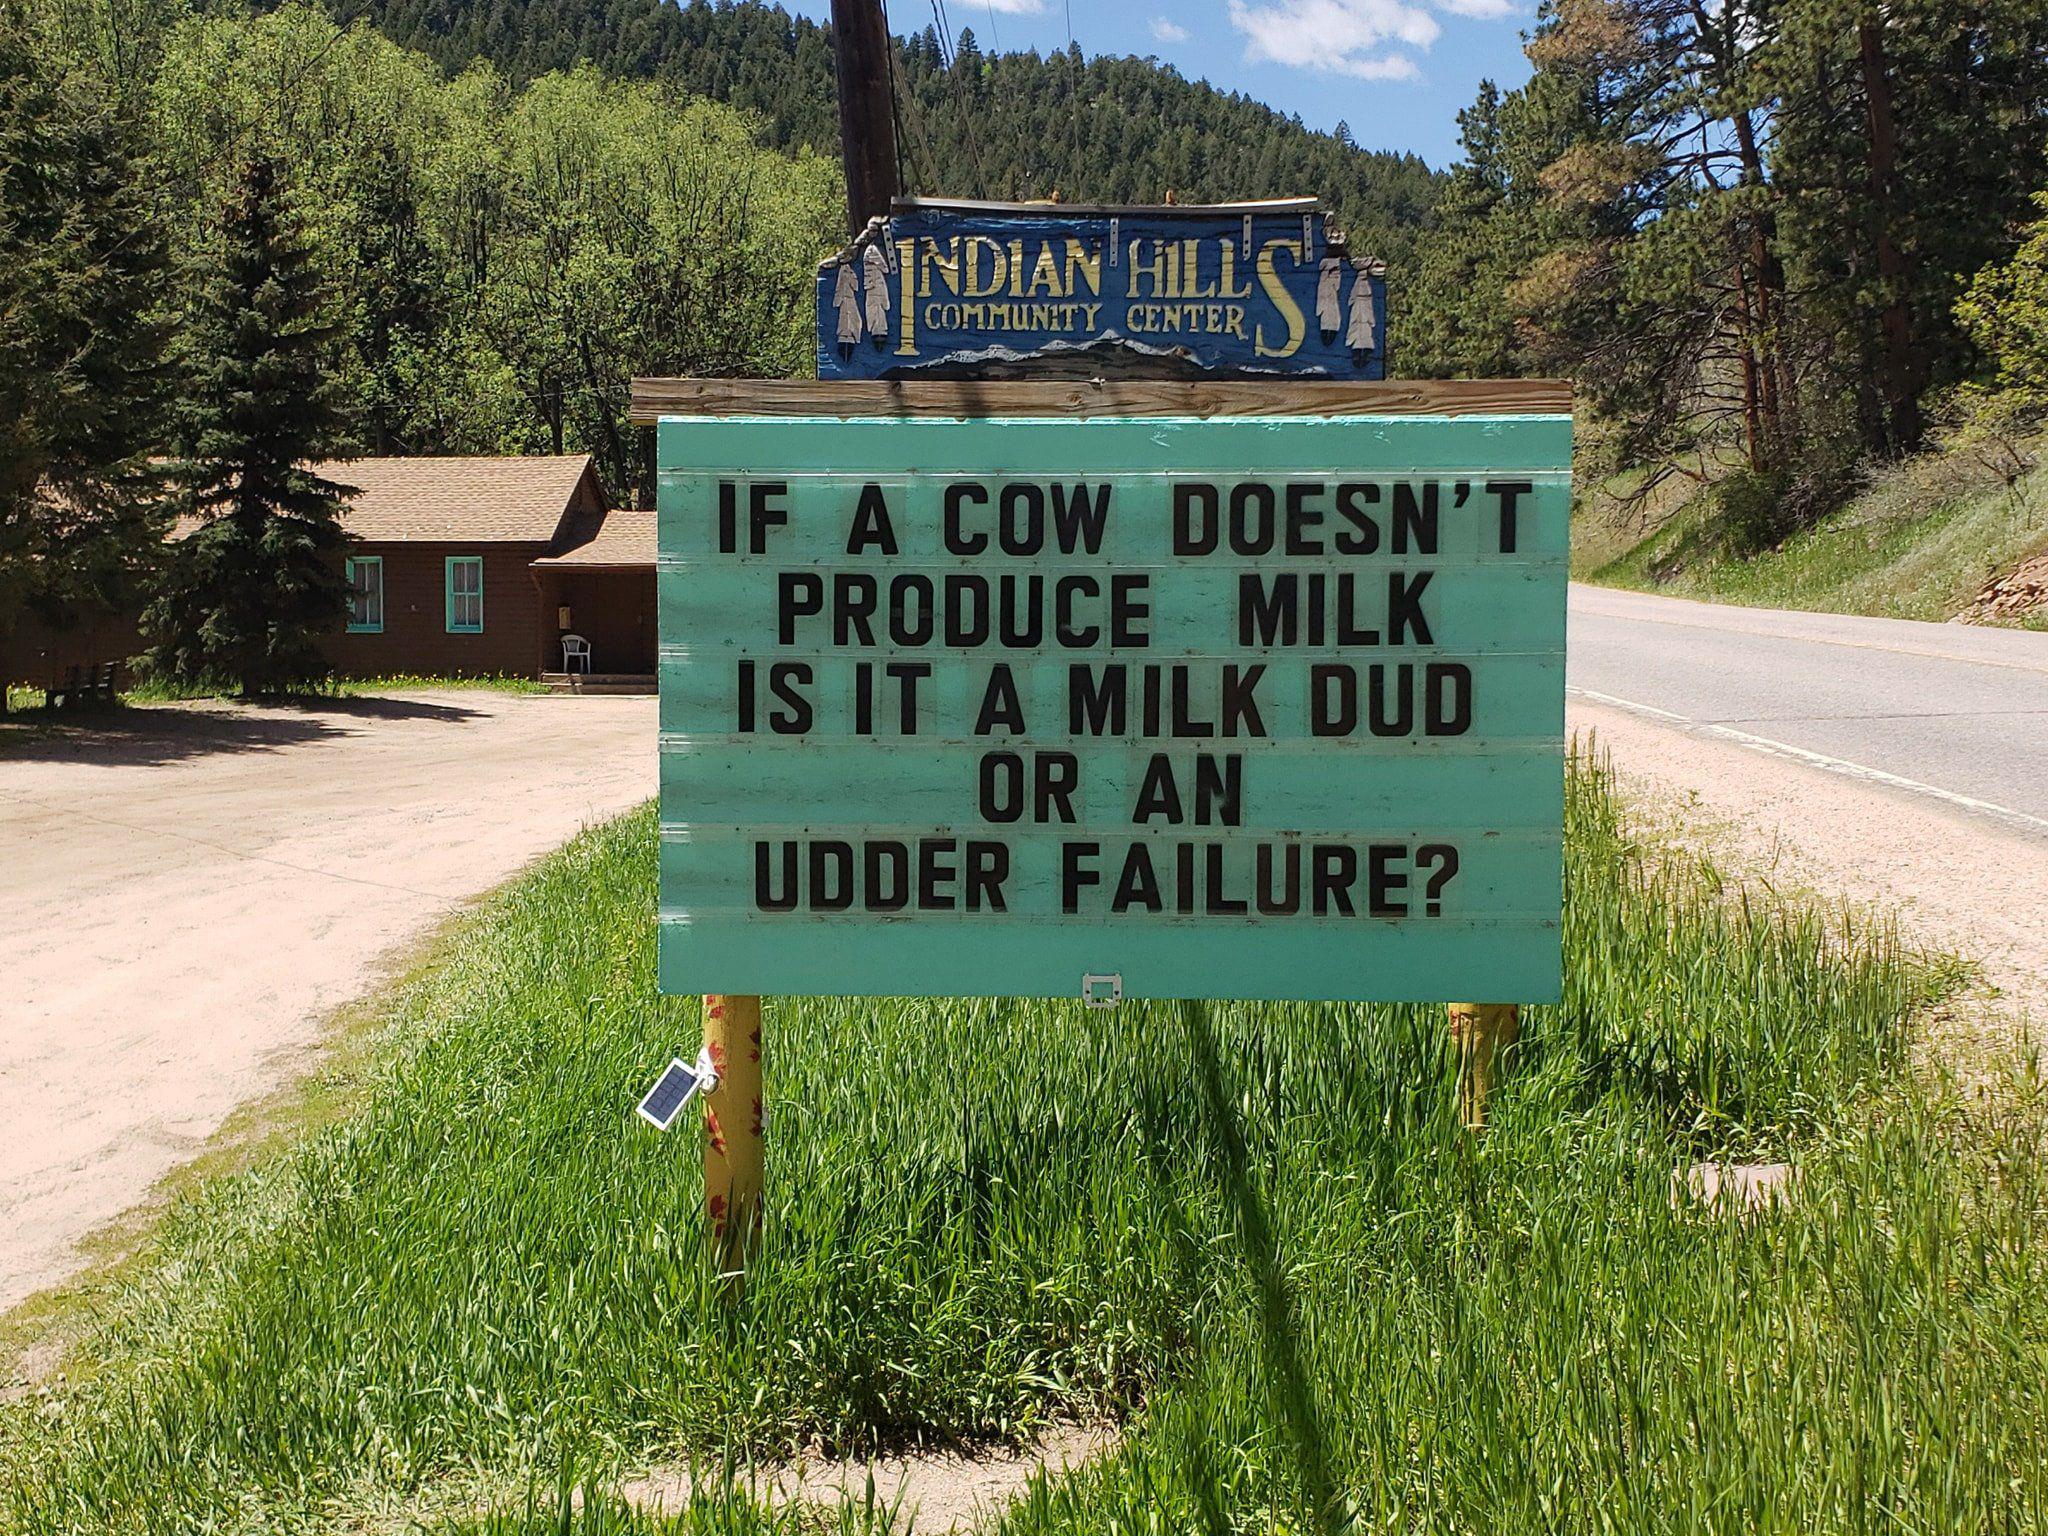 He adds humor to roadside signs